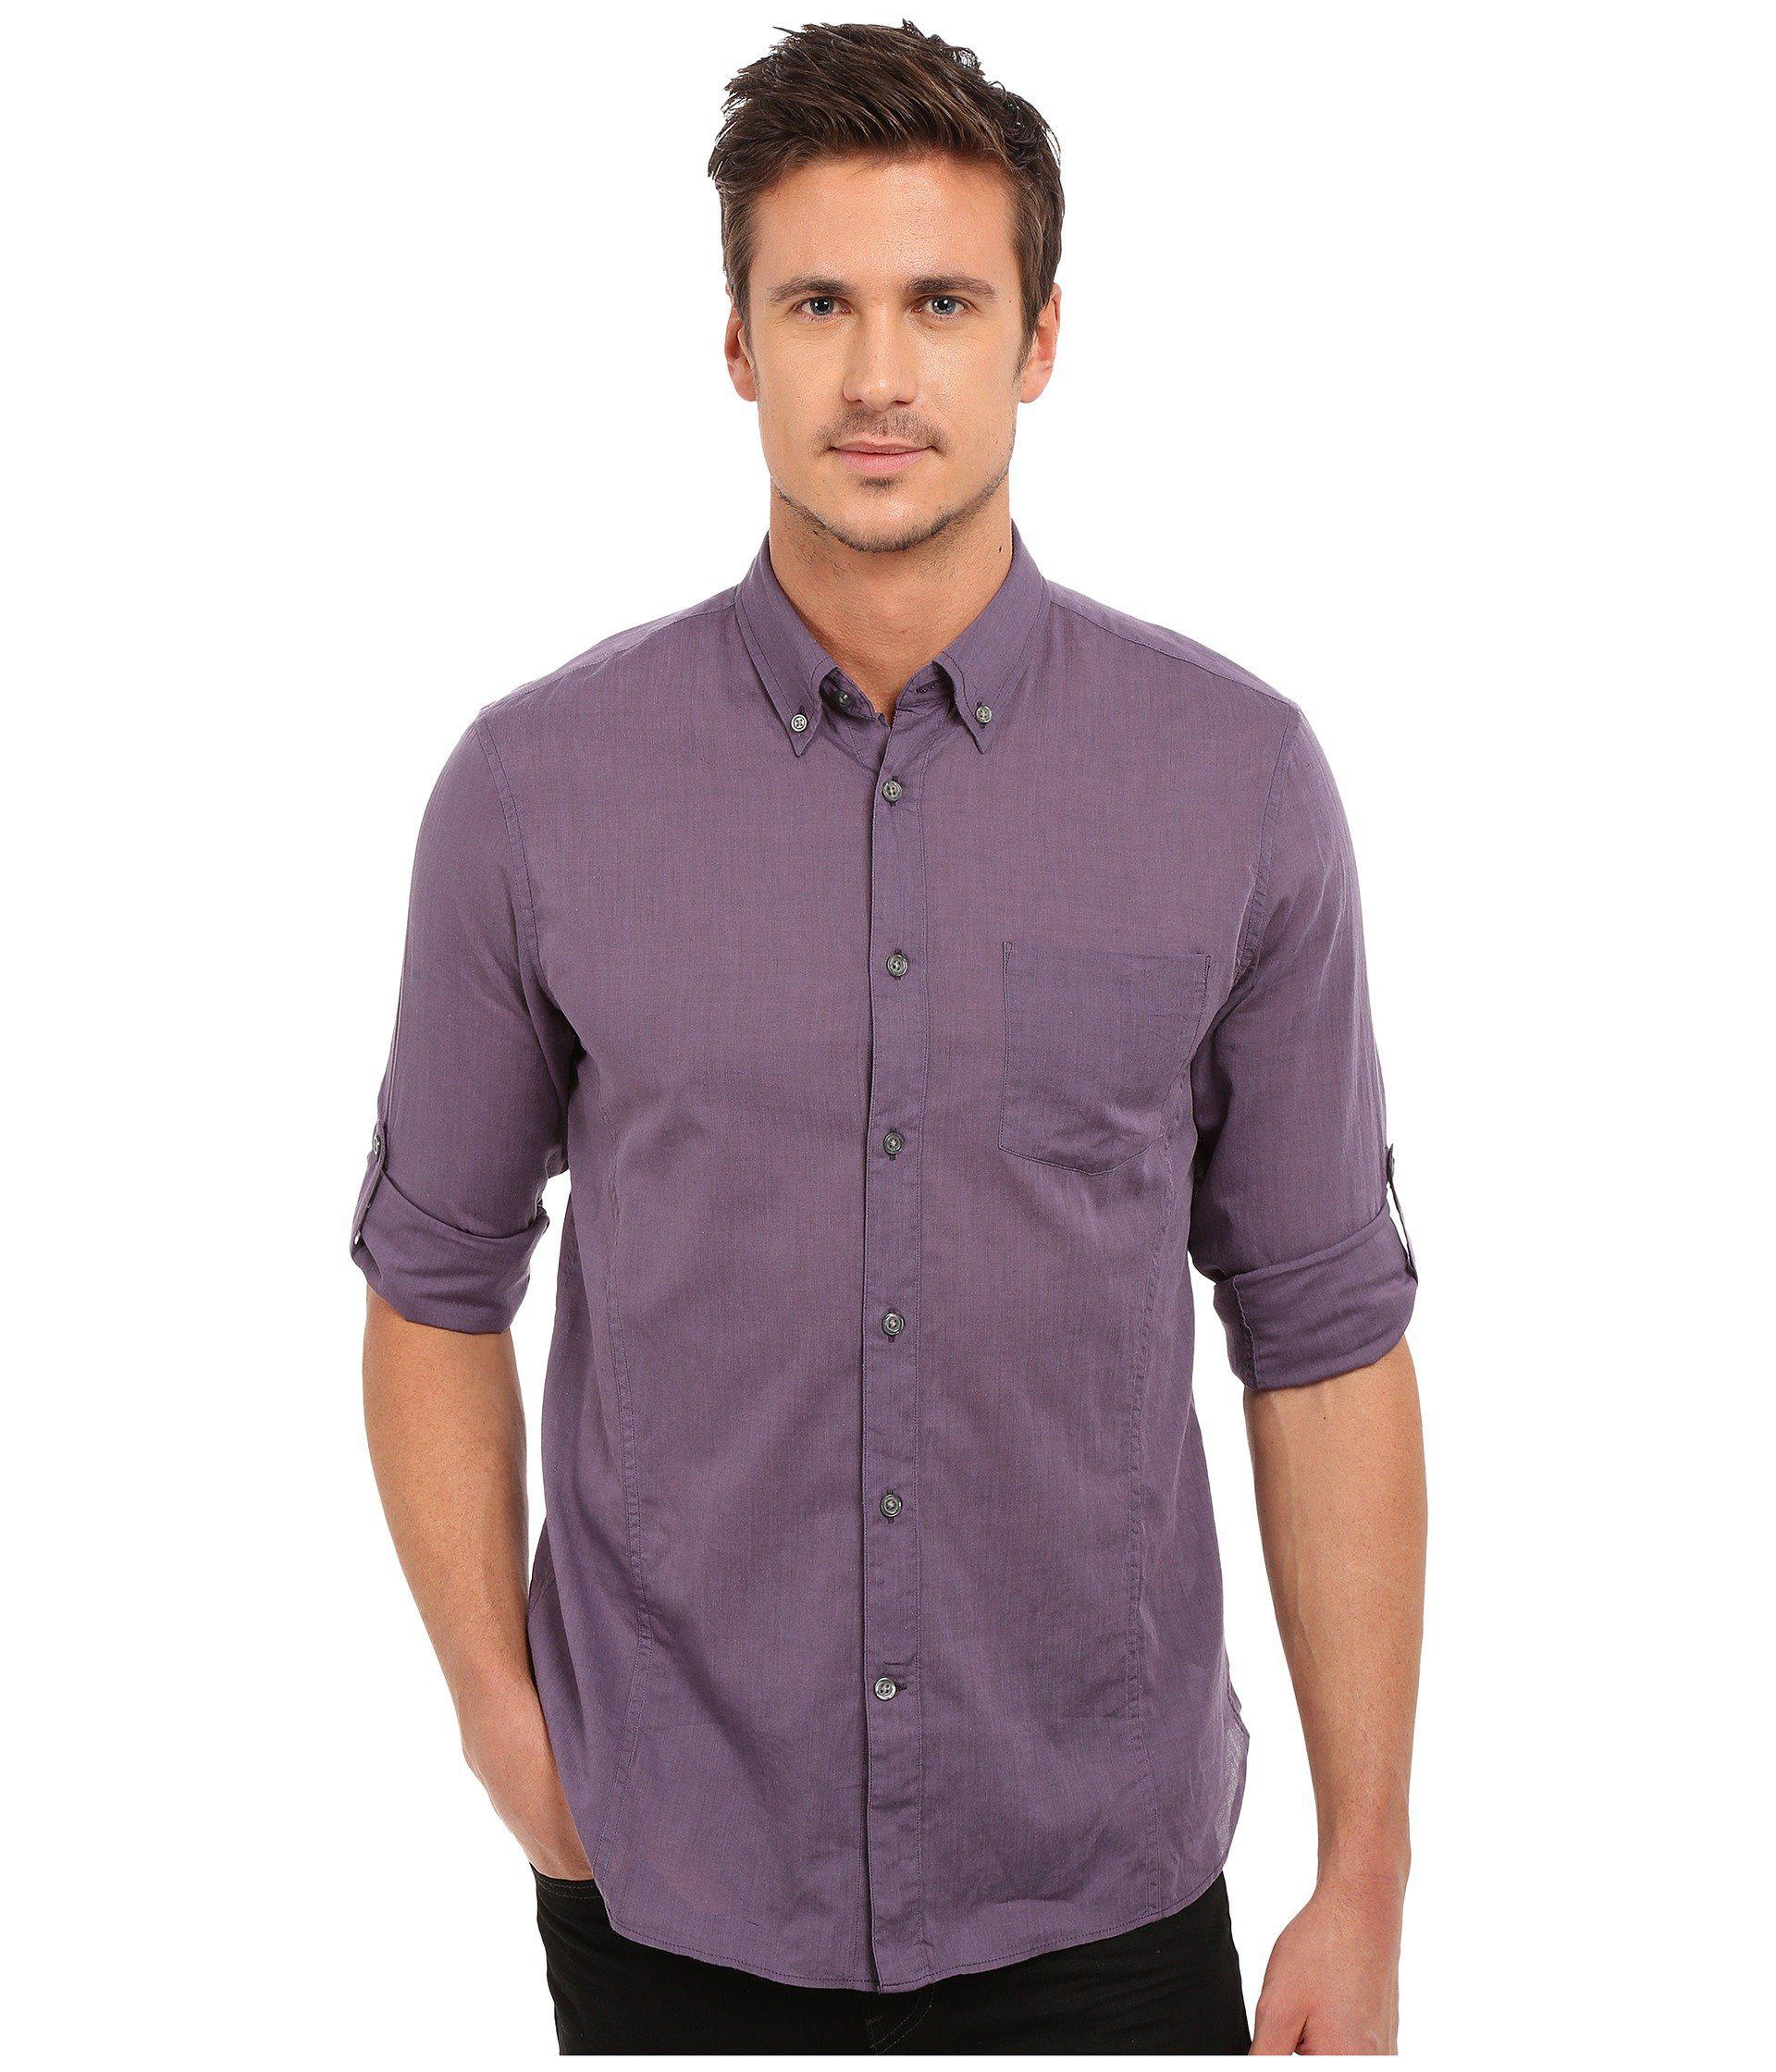 66175f869b1c How To Roll Up Long Sleeve Button Down Shirt « Alzheimer's Network ...